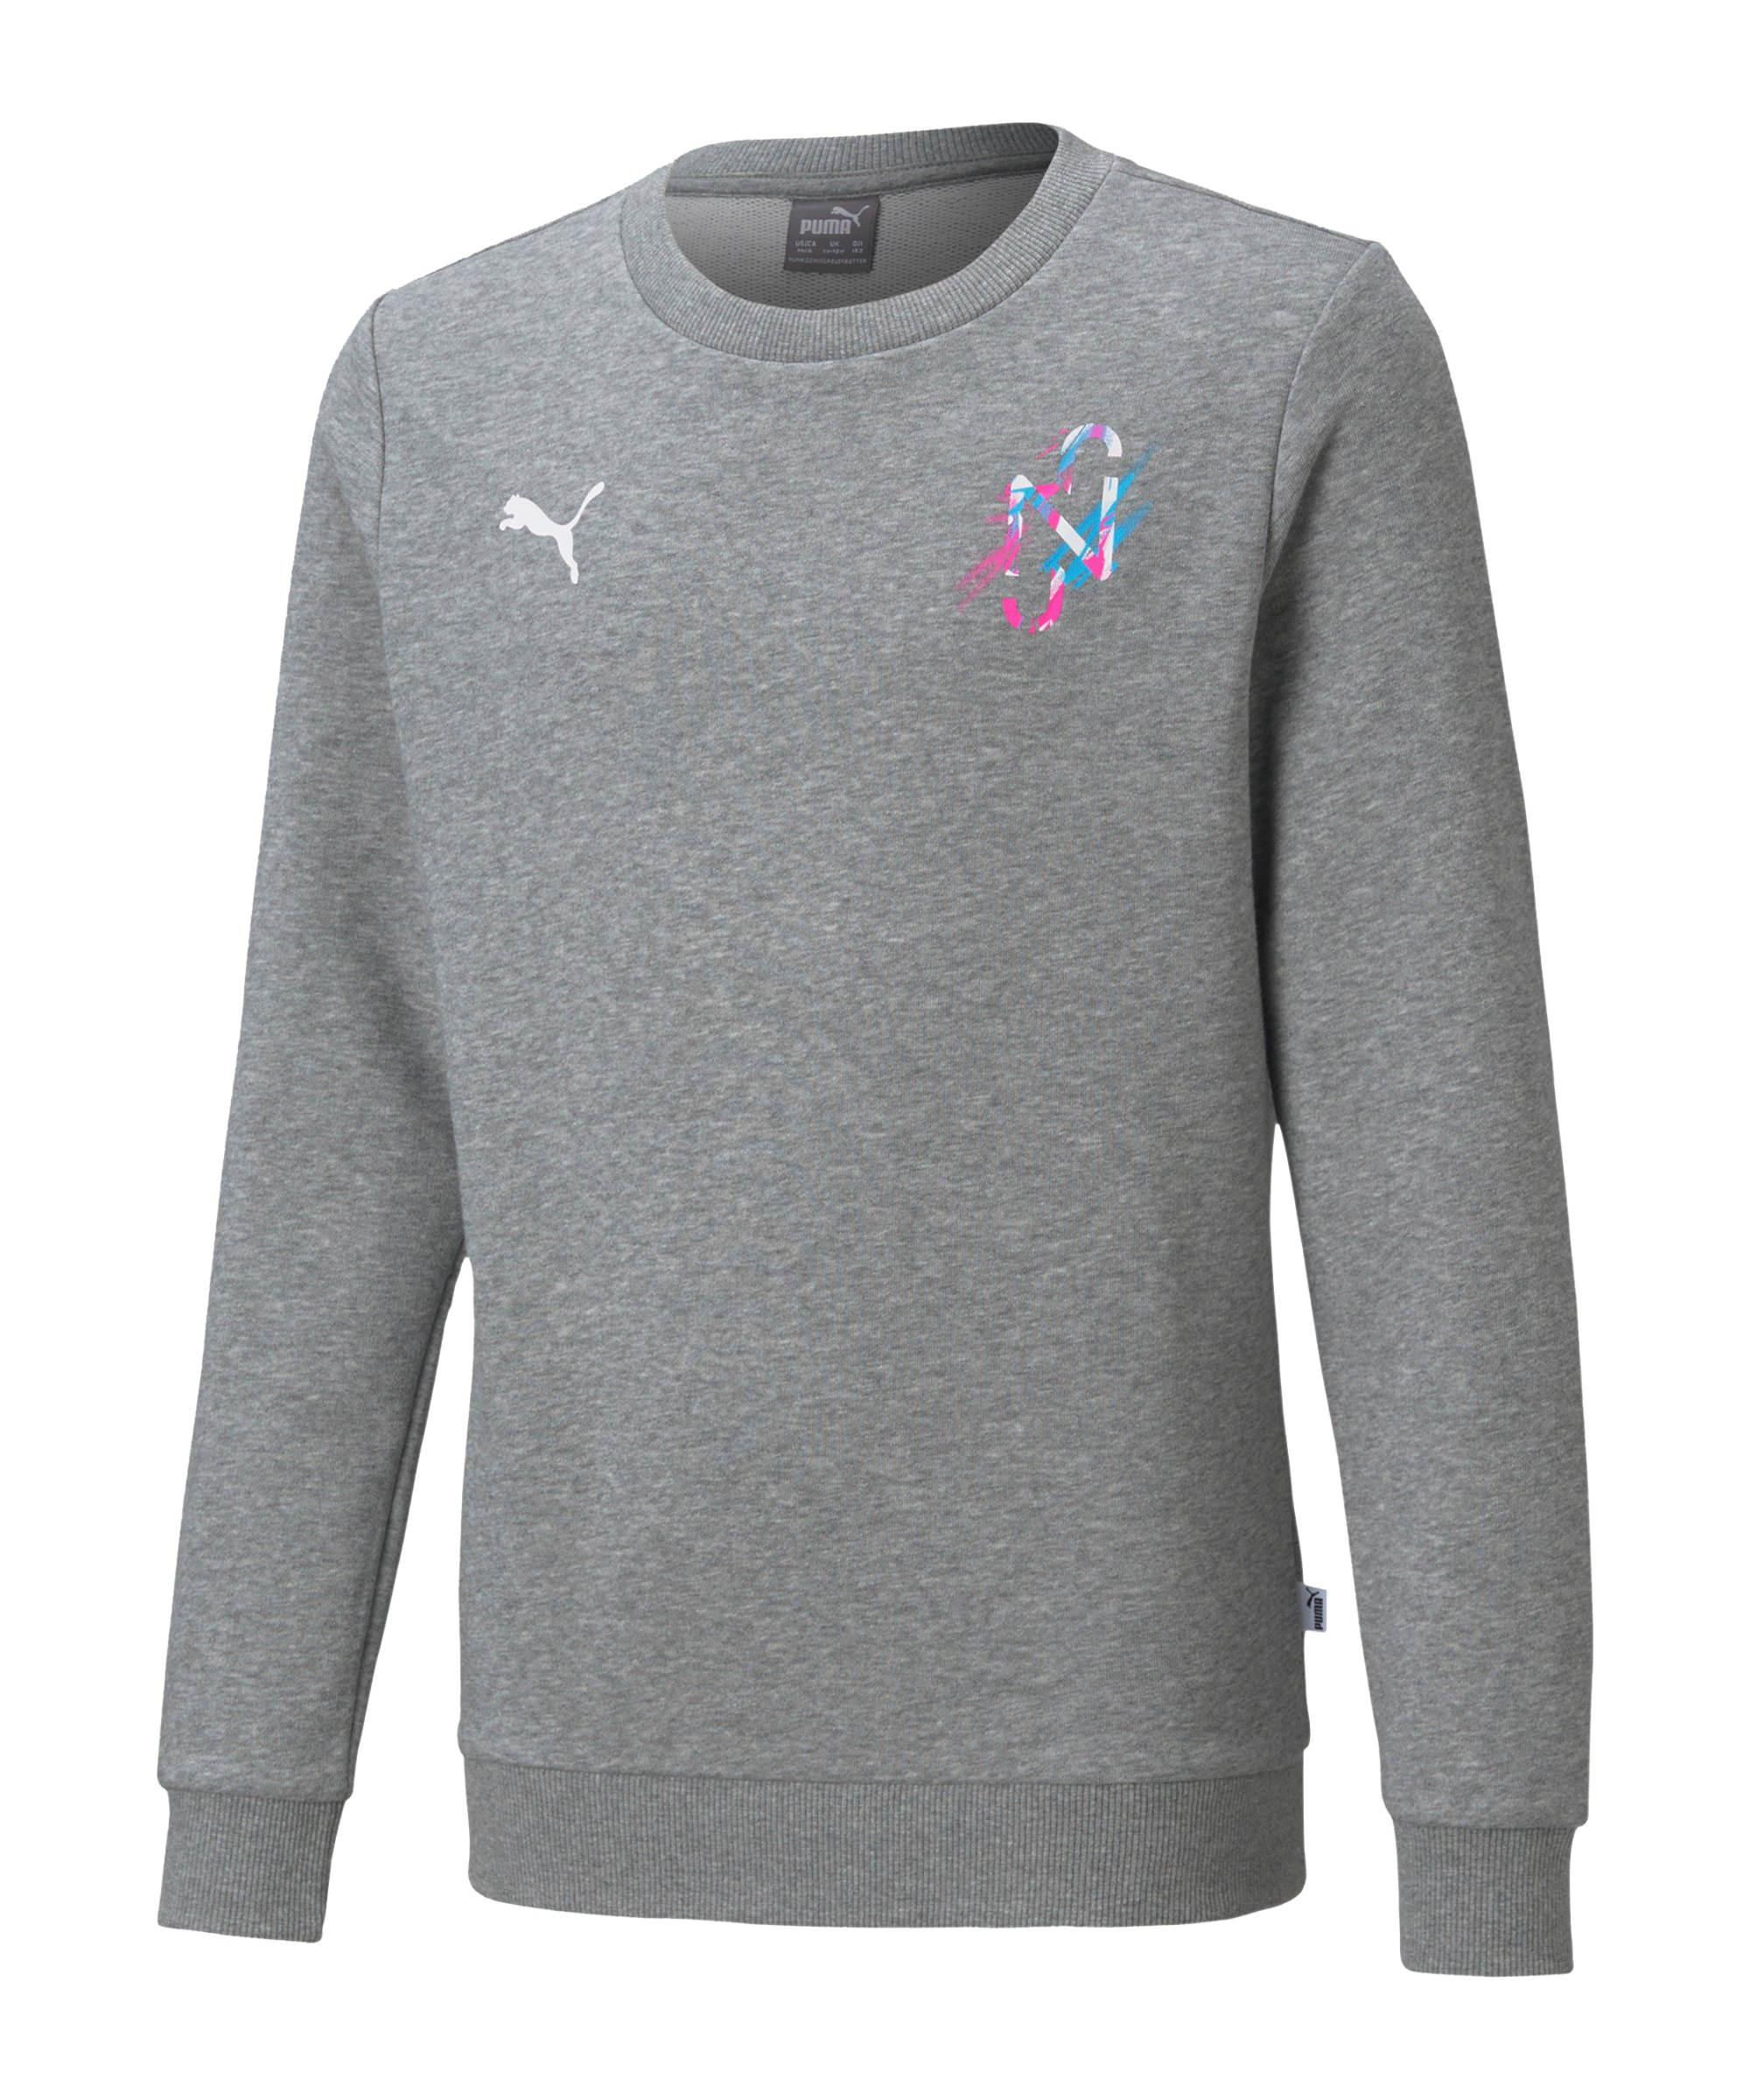 PUMA NJR CREATIVITY Sweatshirt Kids F06 - grau